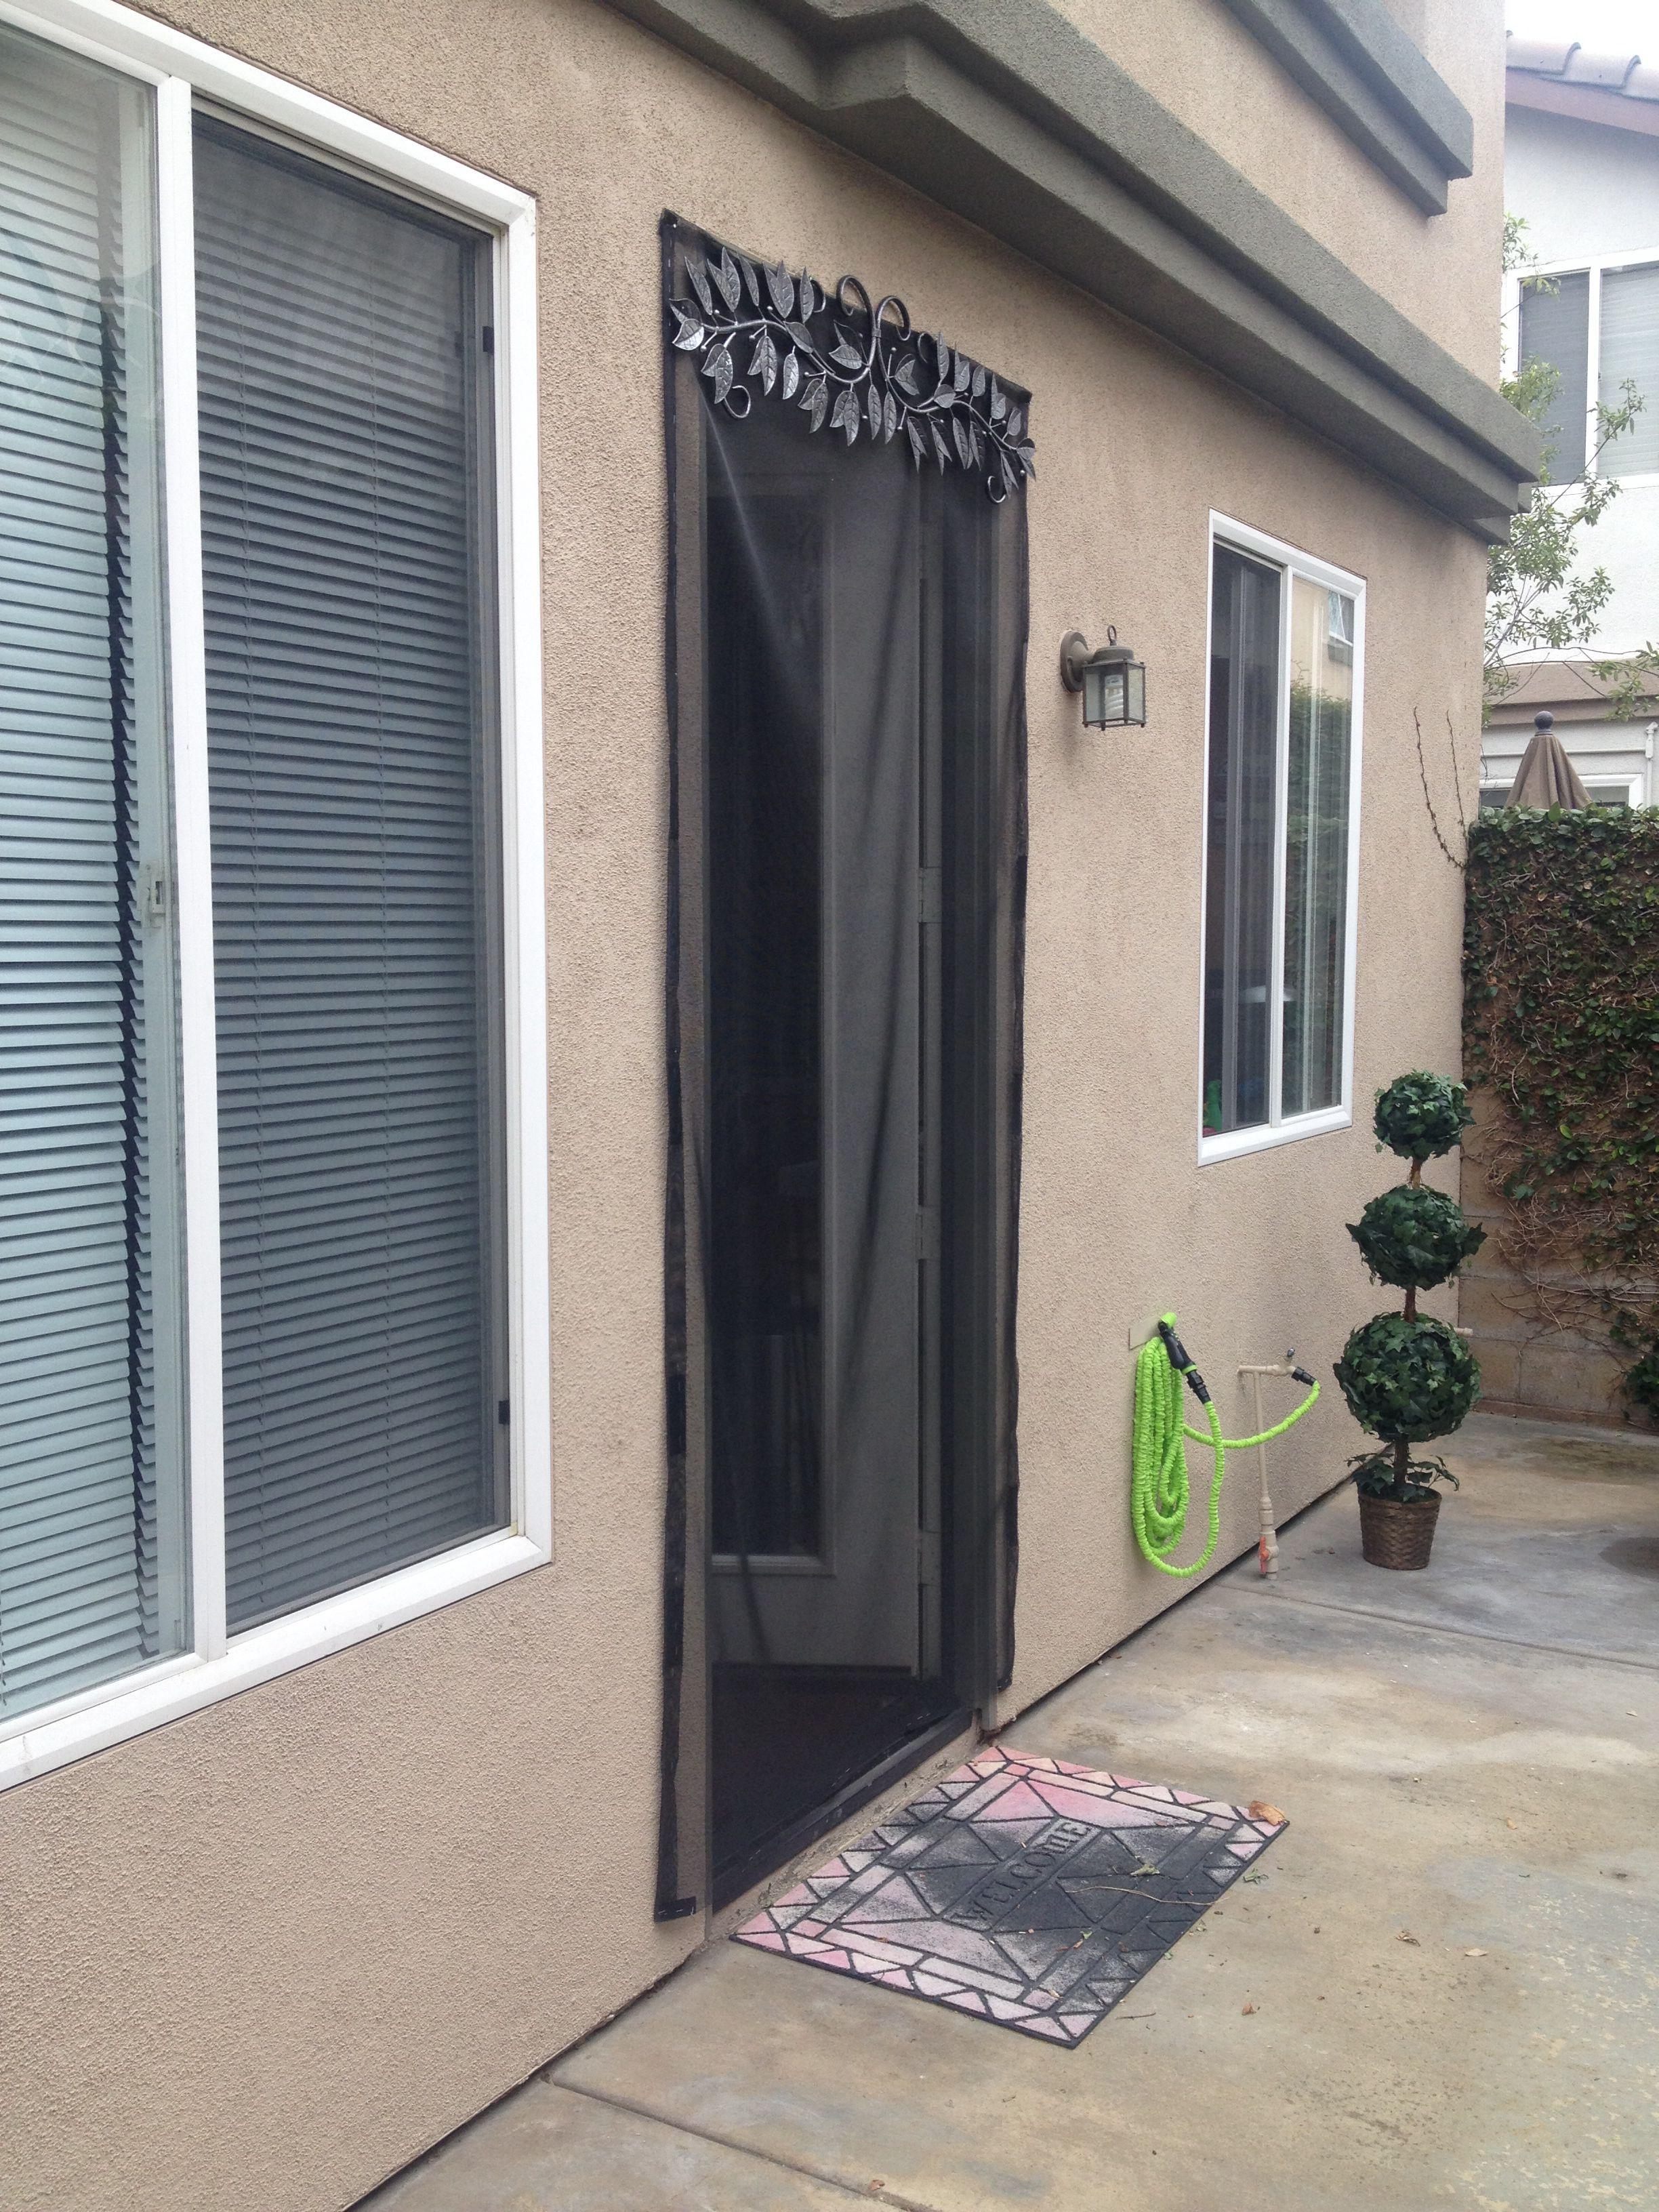 Easy And Fast Diy Screen Door For Apartments Home Rentals Diy